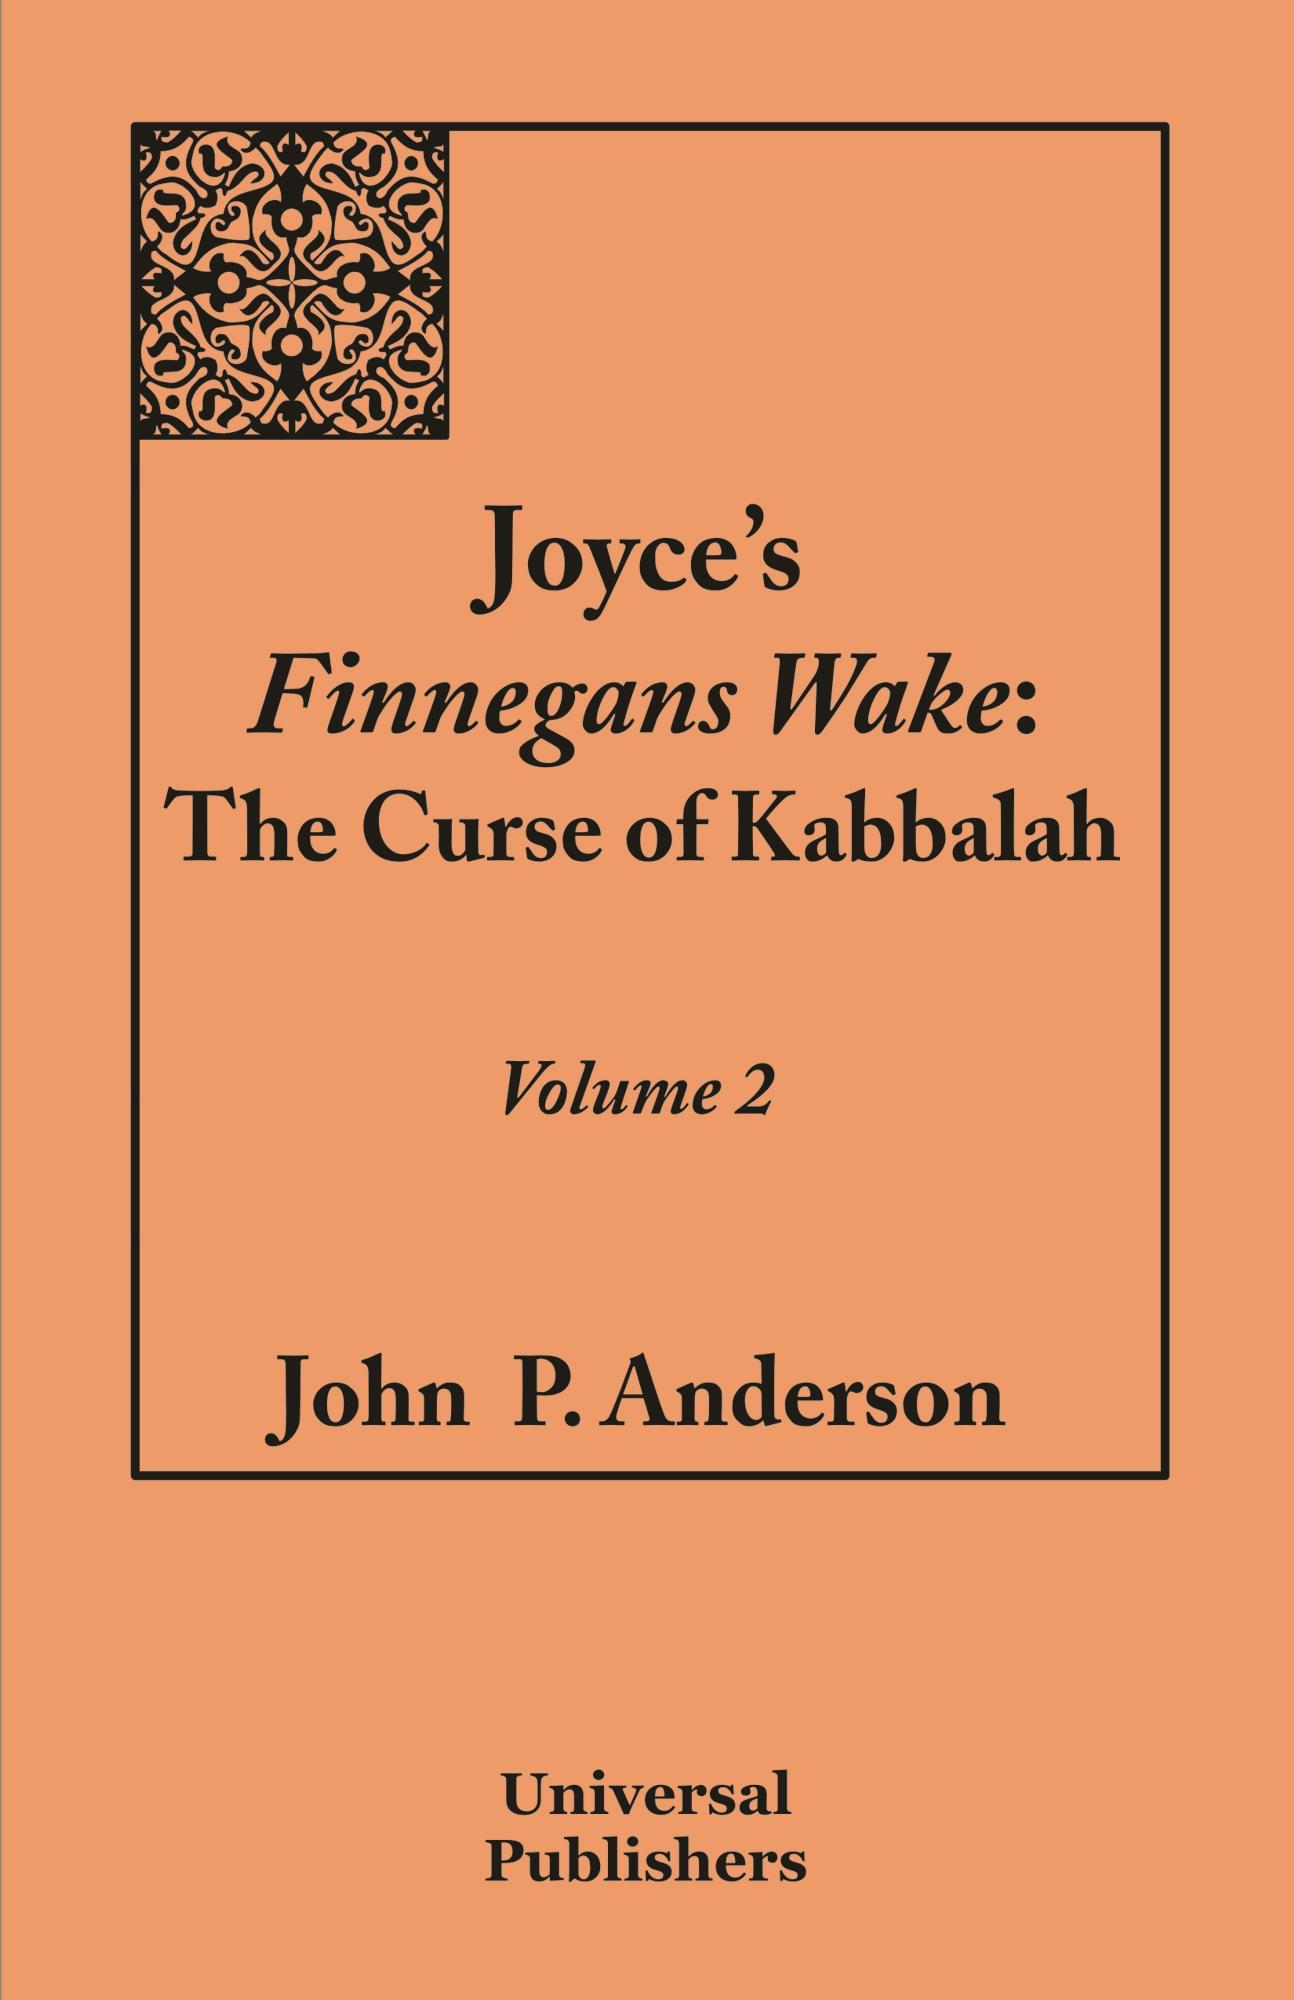 Joyce's Finnegans Wake: The Curse of Kabbalah: Volume 2 EB9781599429007